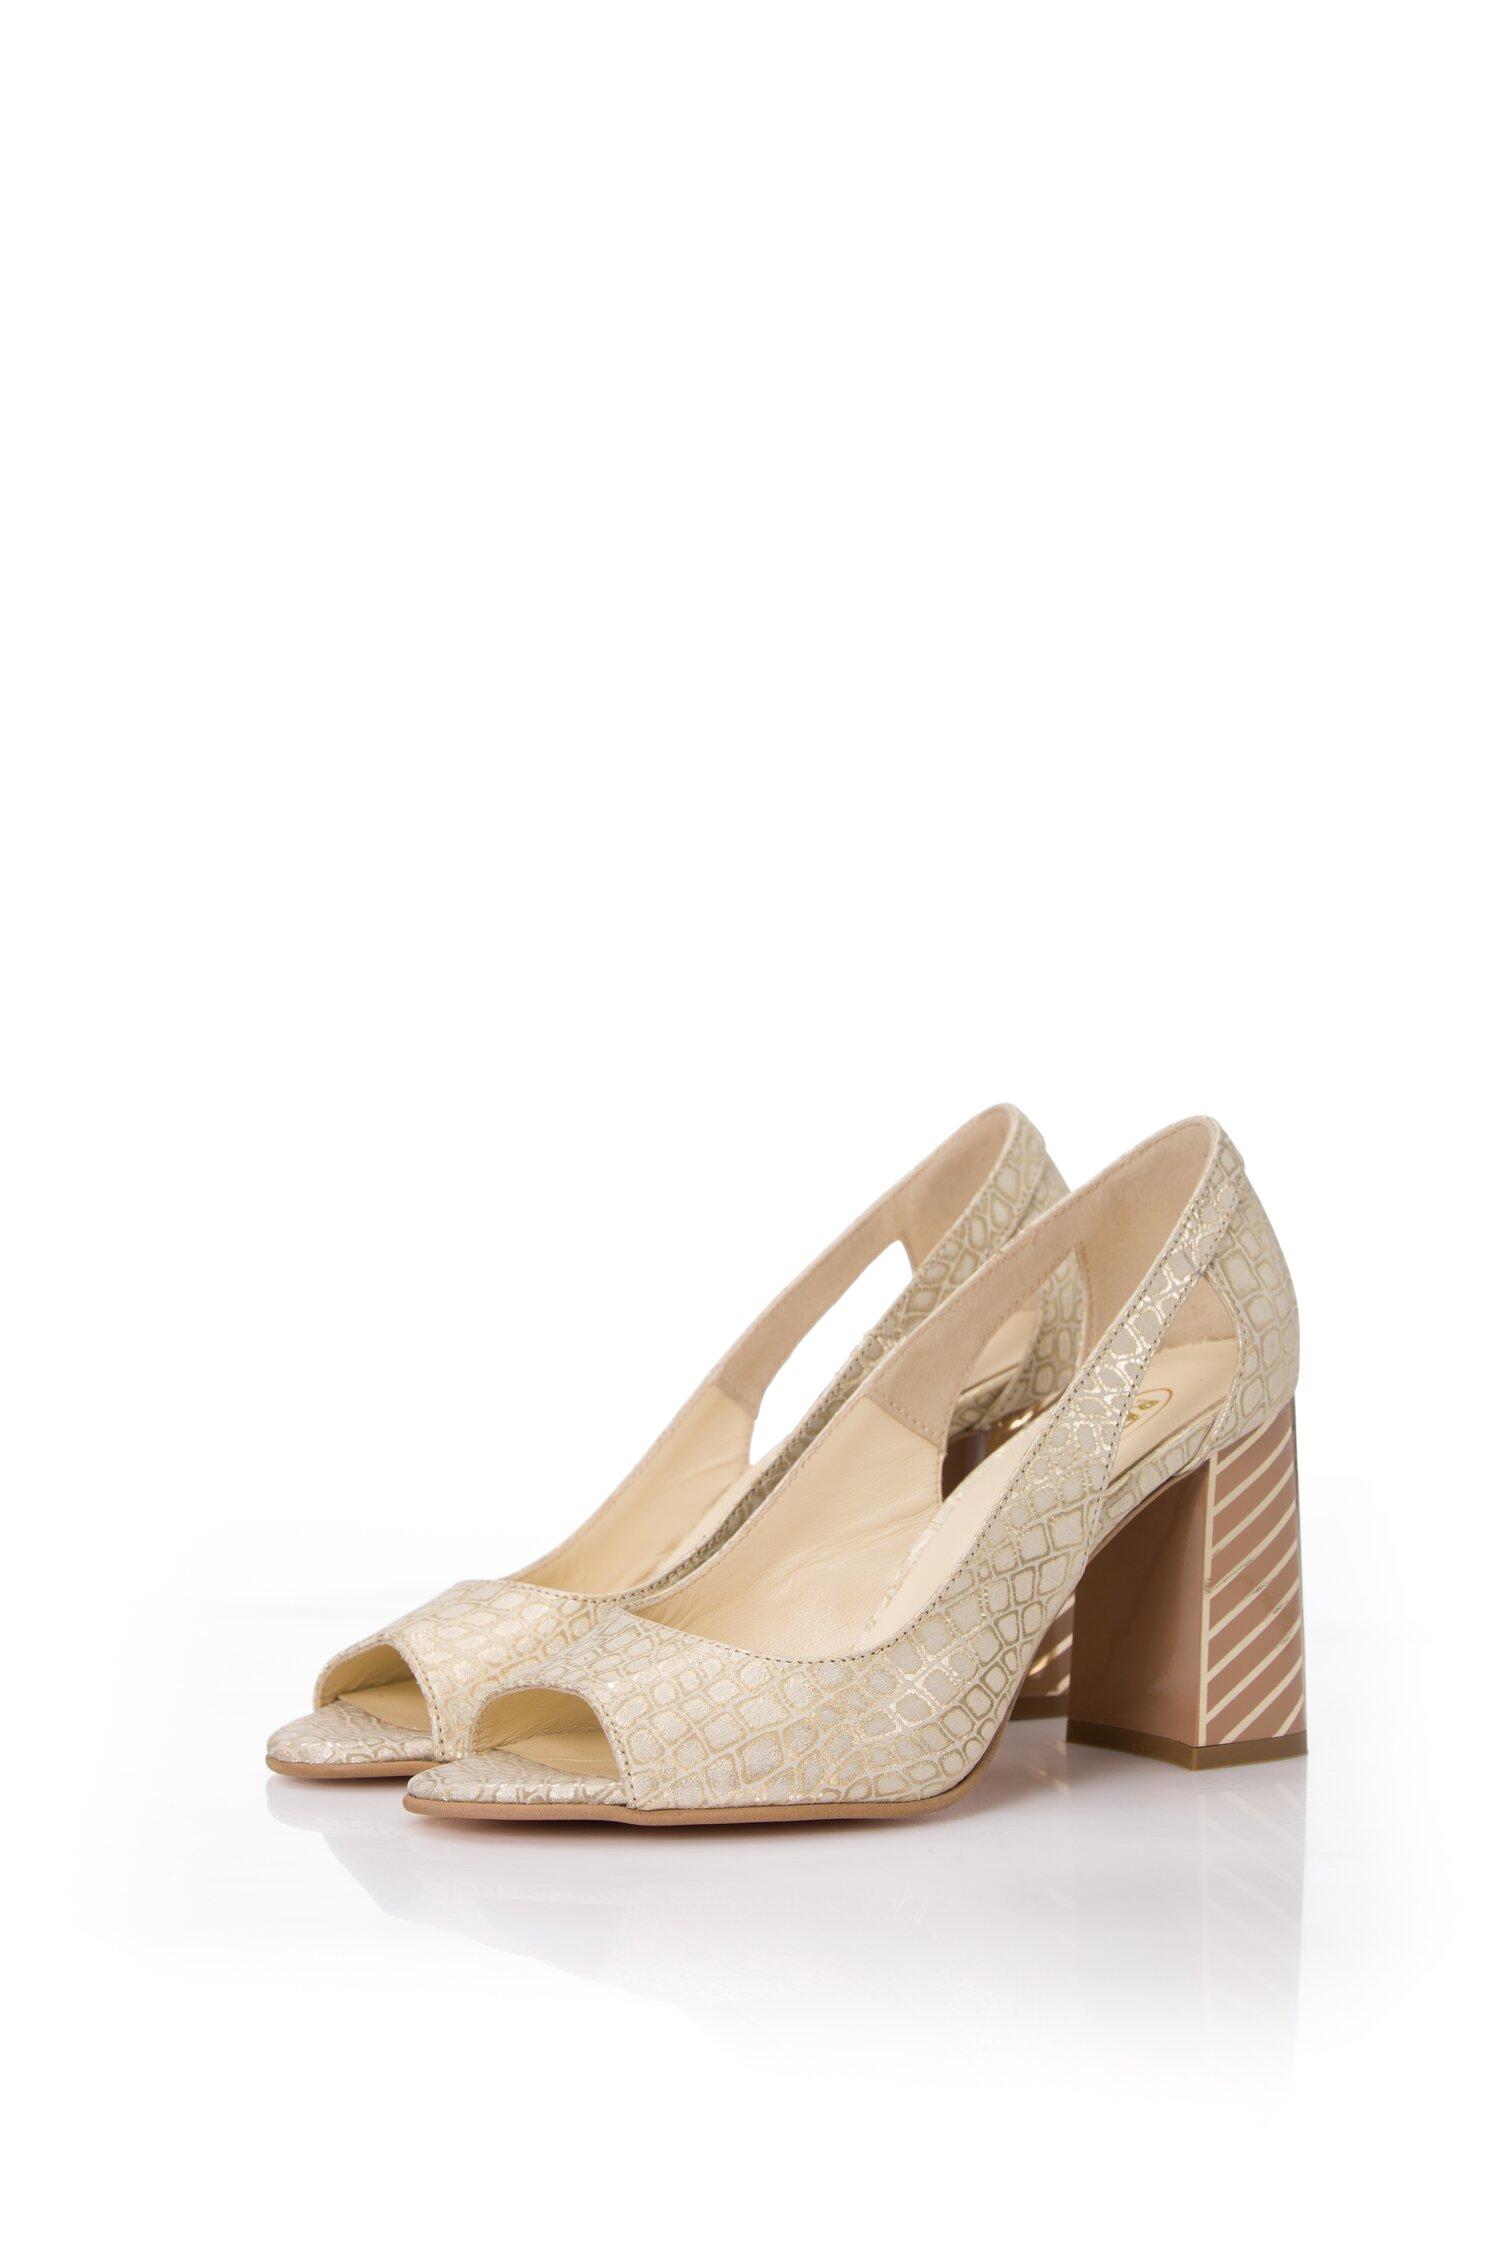 Pantofi aurii cu imprimeu reflectorizant si decupaj la varf imagine